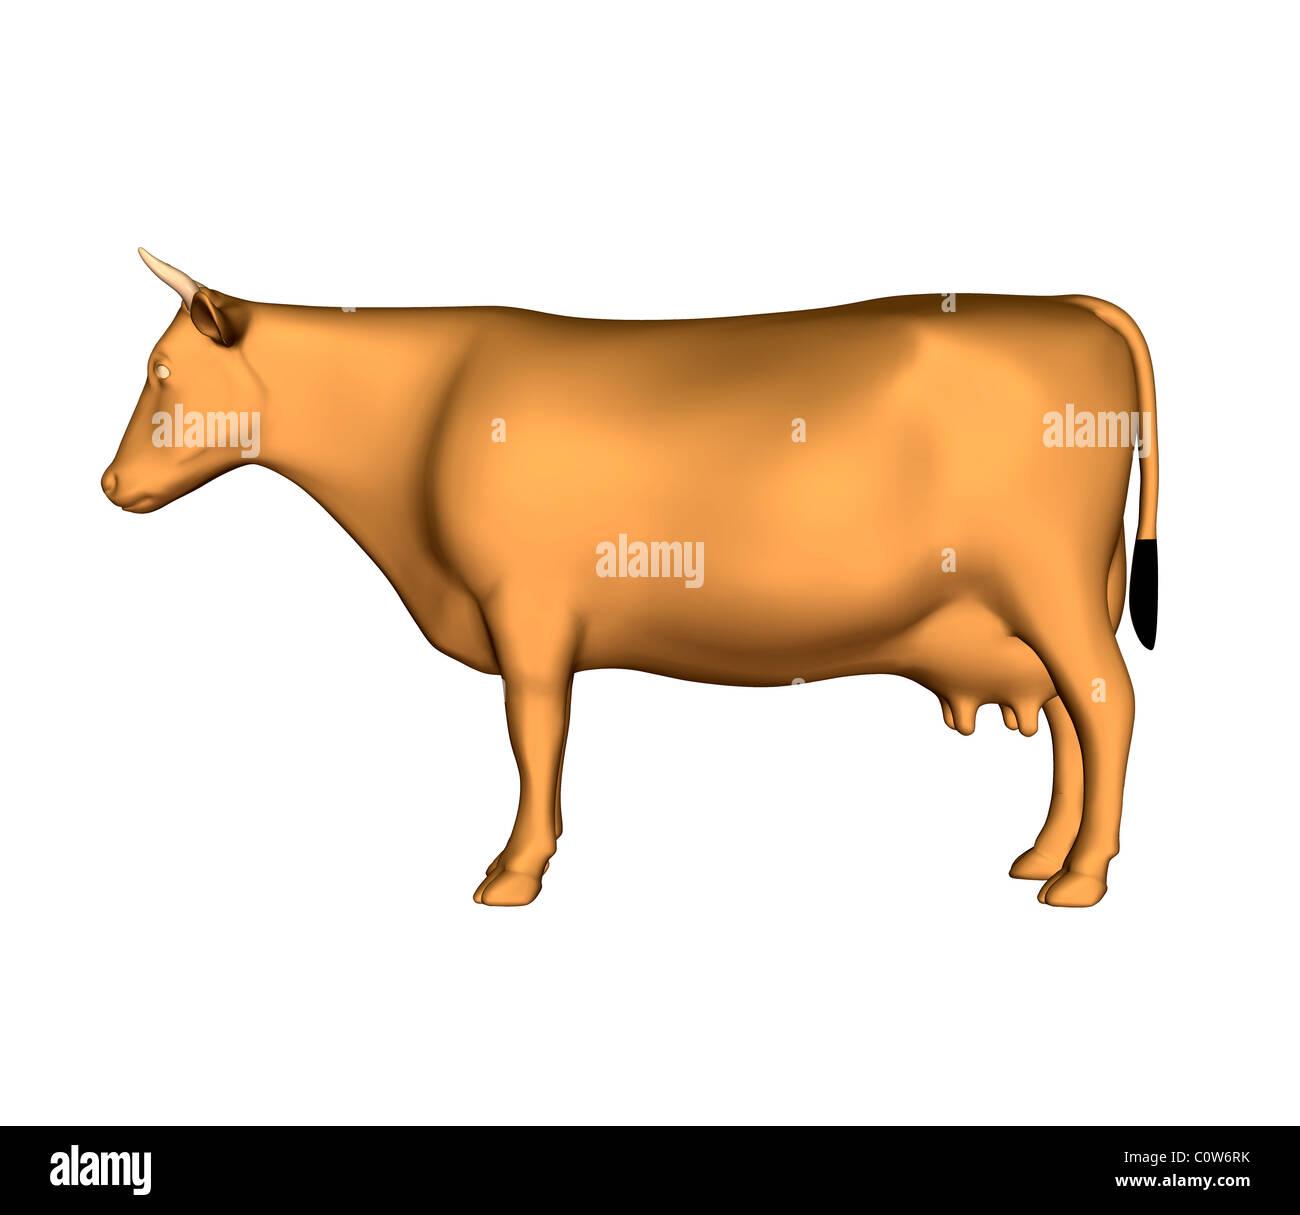 cow - Stock Image